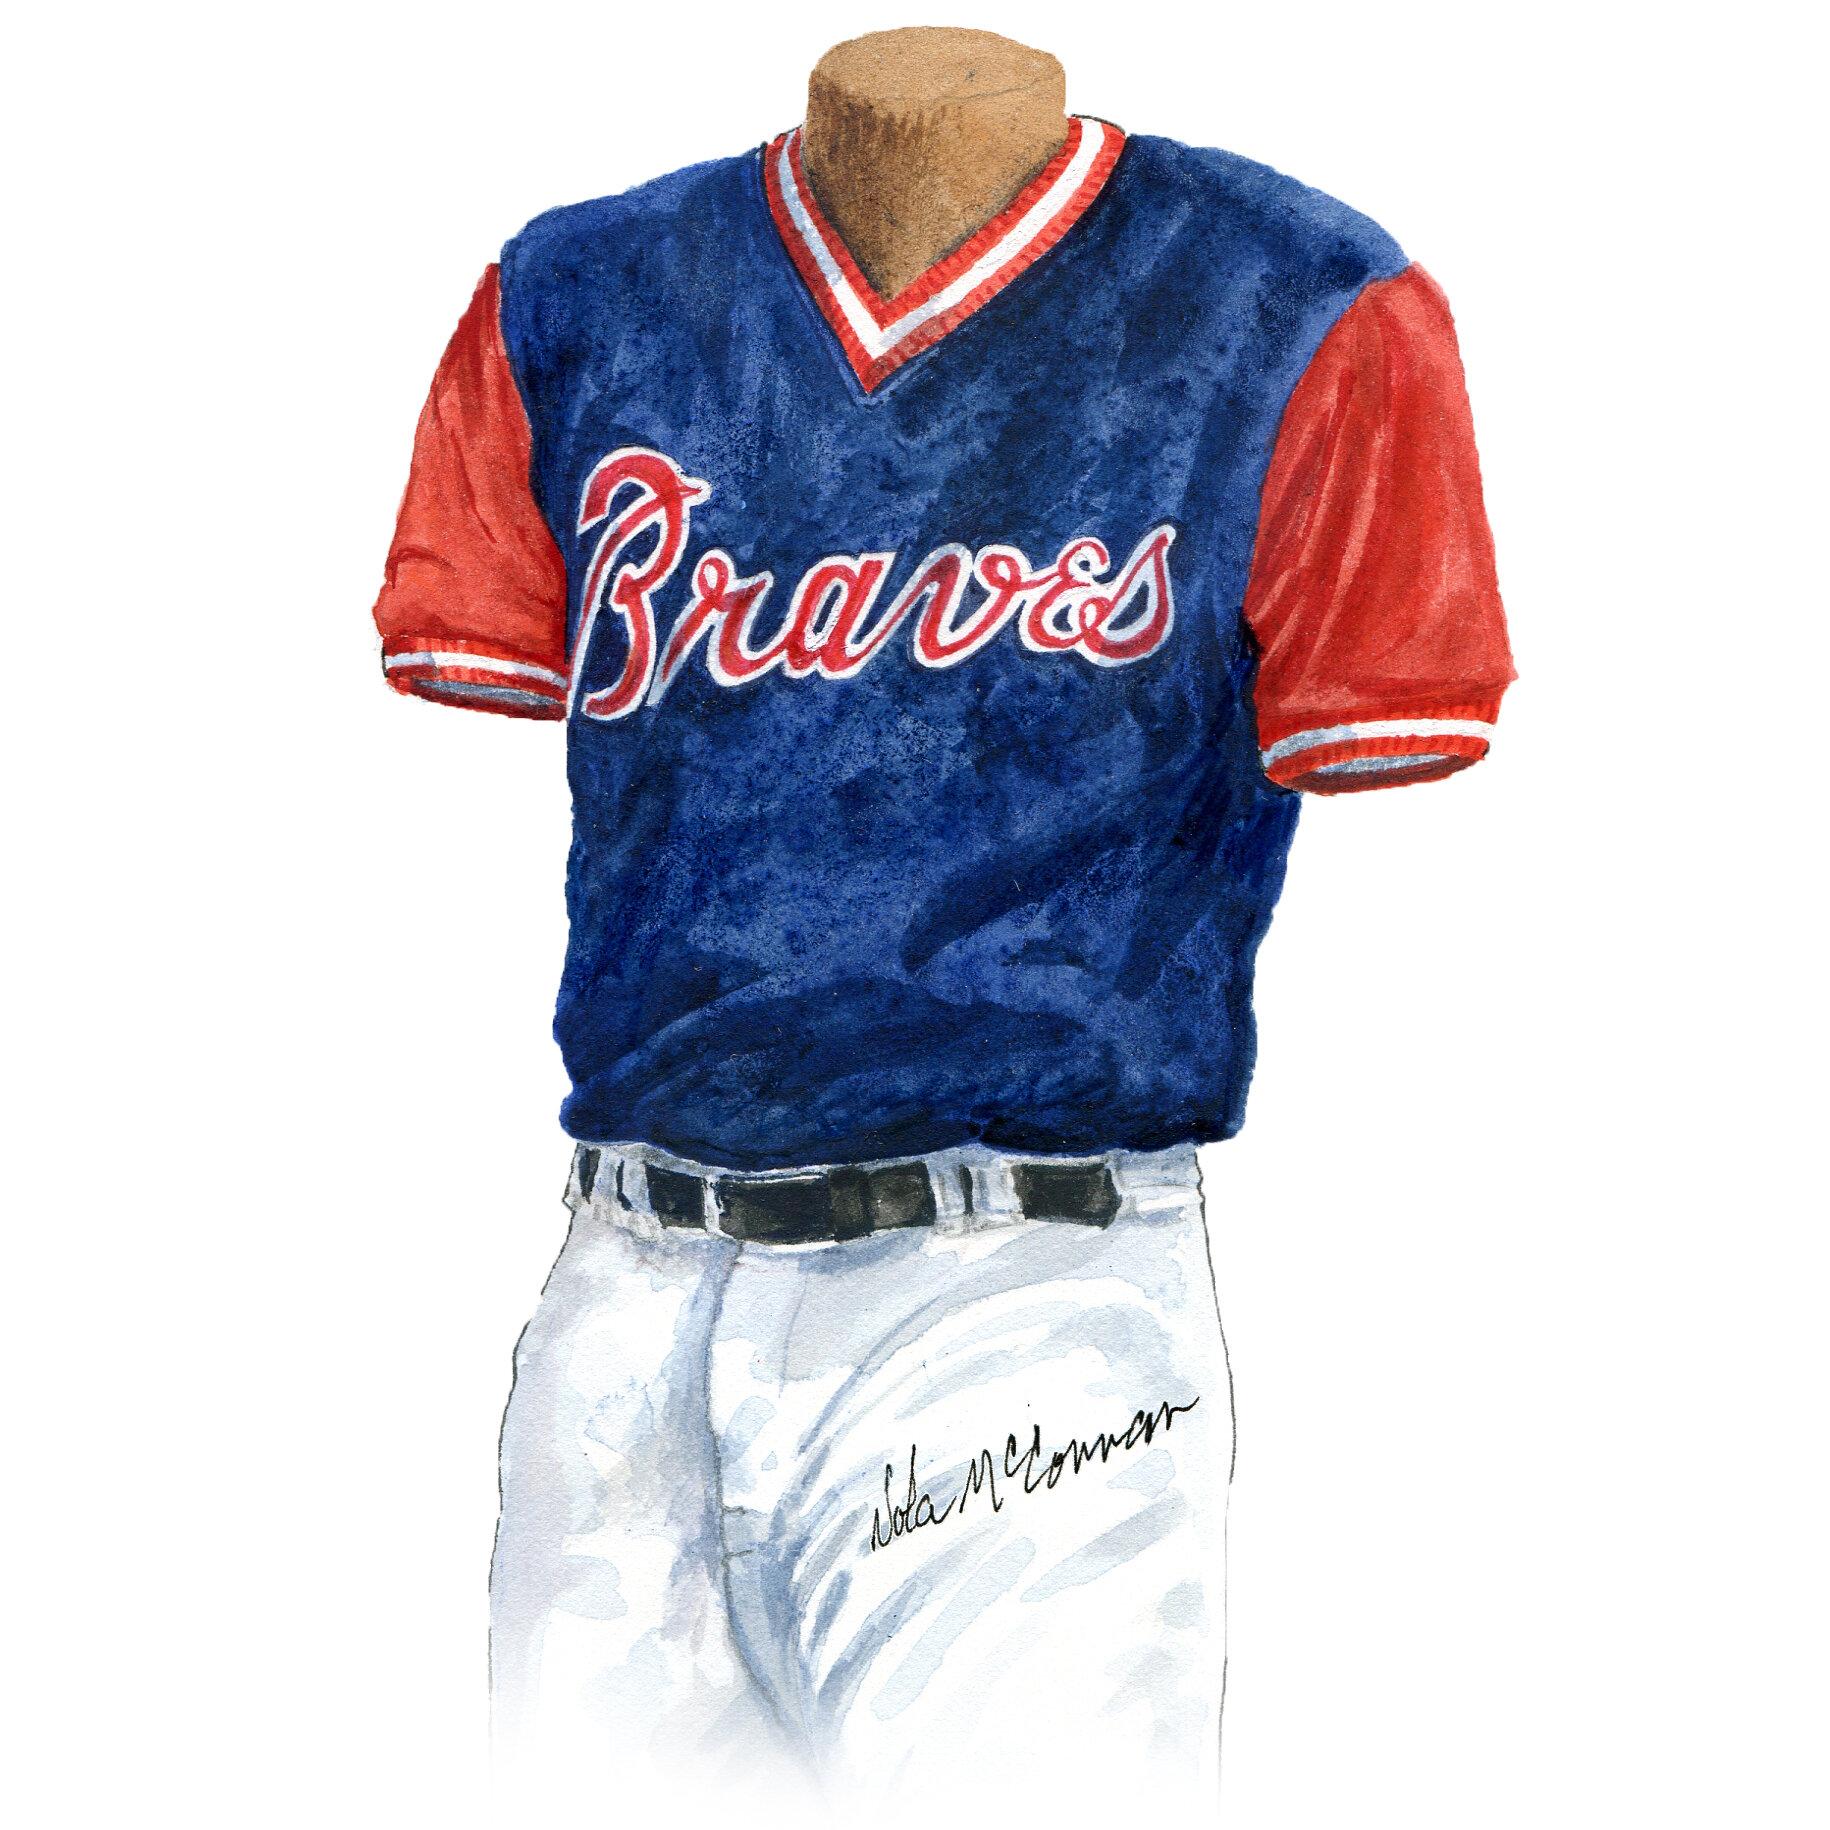 2017 Braves CanAm.jpg